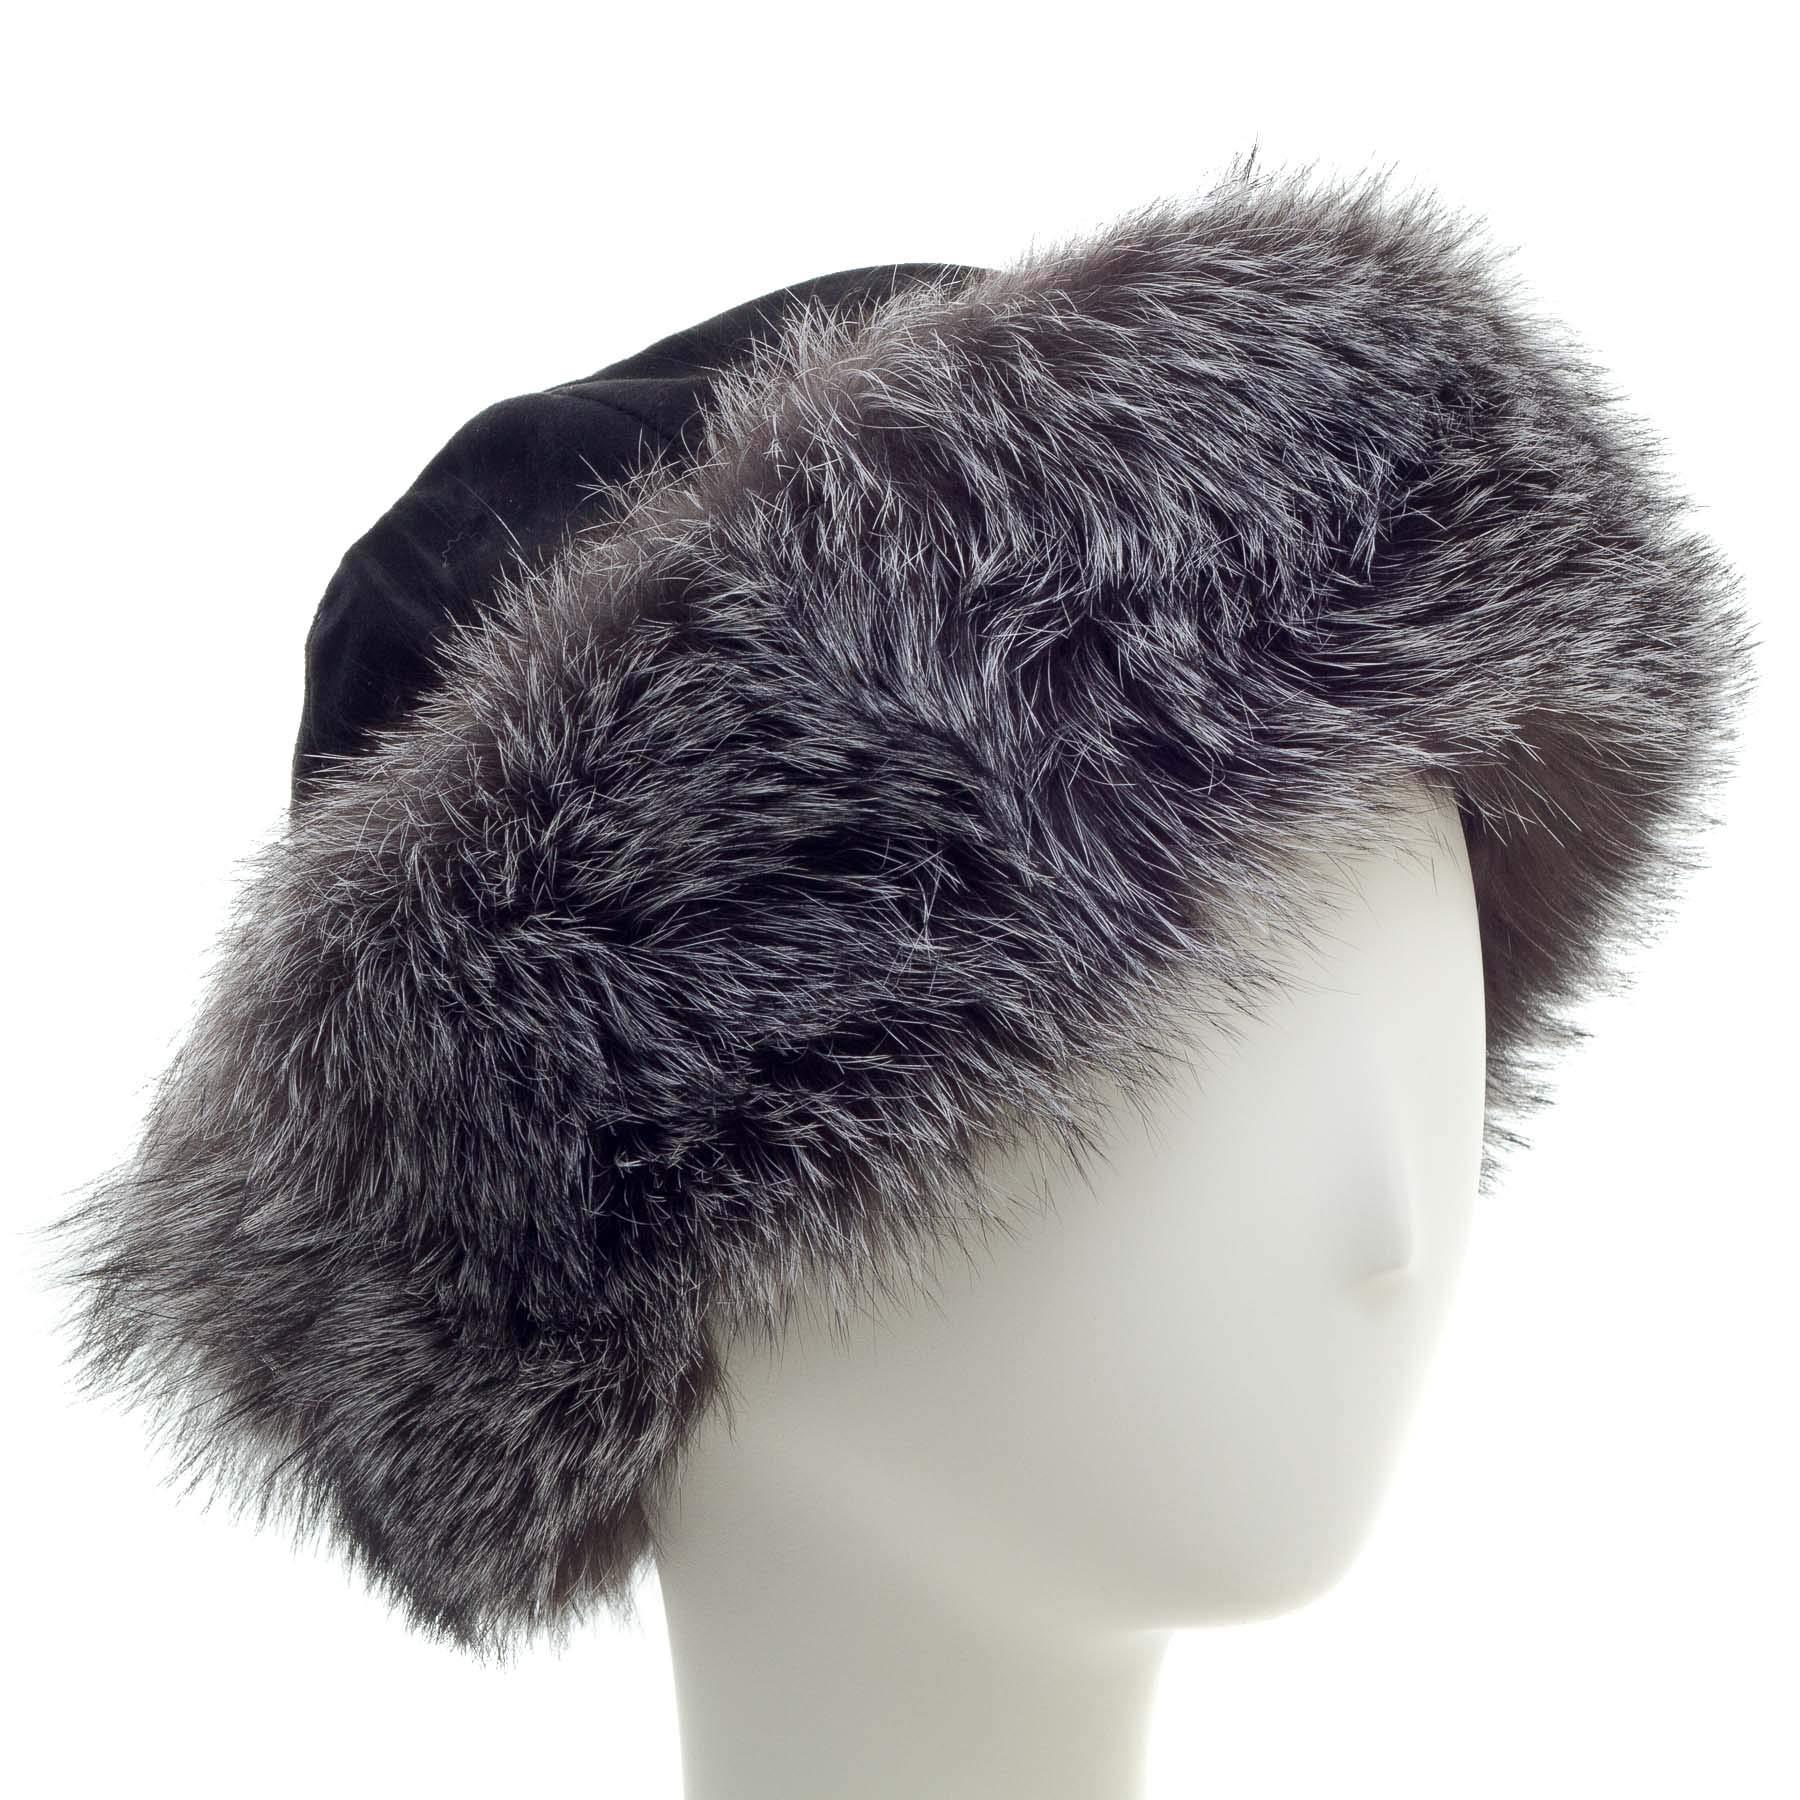 surell Fox Cuff Winter Hat - Warm Winter Fashion - Bridal Wedding Attire Black by surell (Image #1)